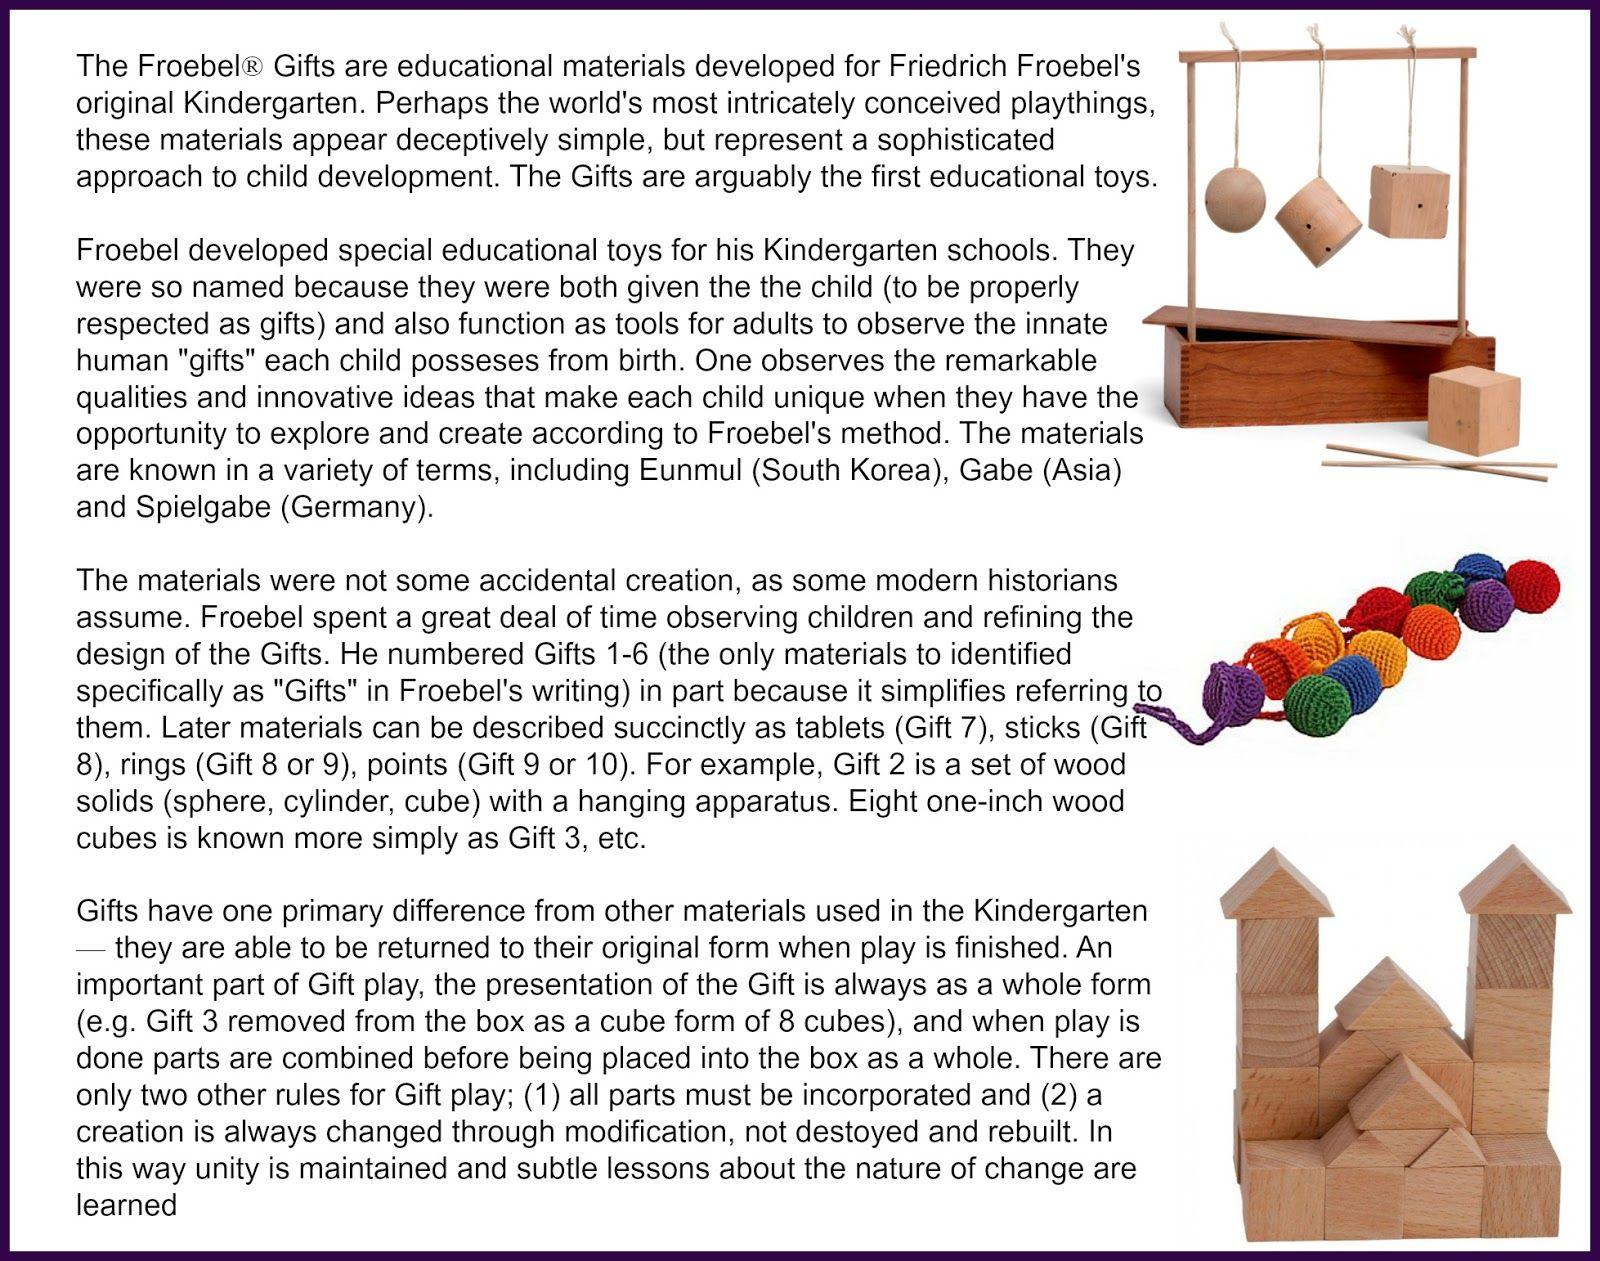 Froebel Gifts - The Original Spielgabe or Spielgaben | The ...